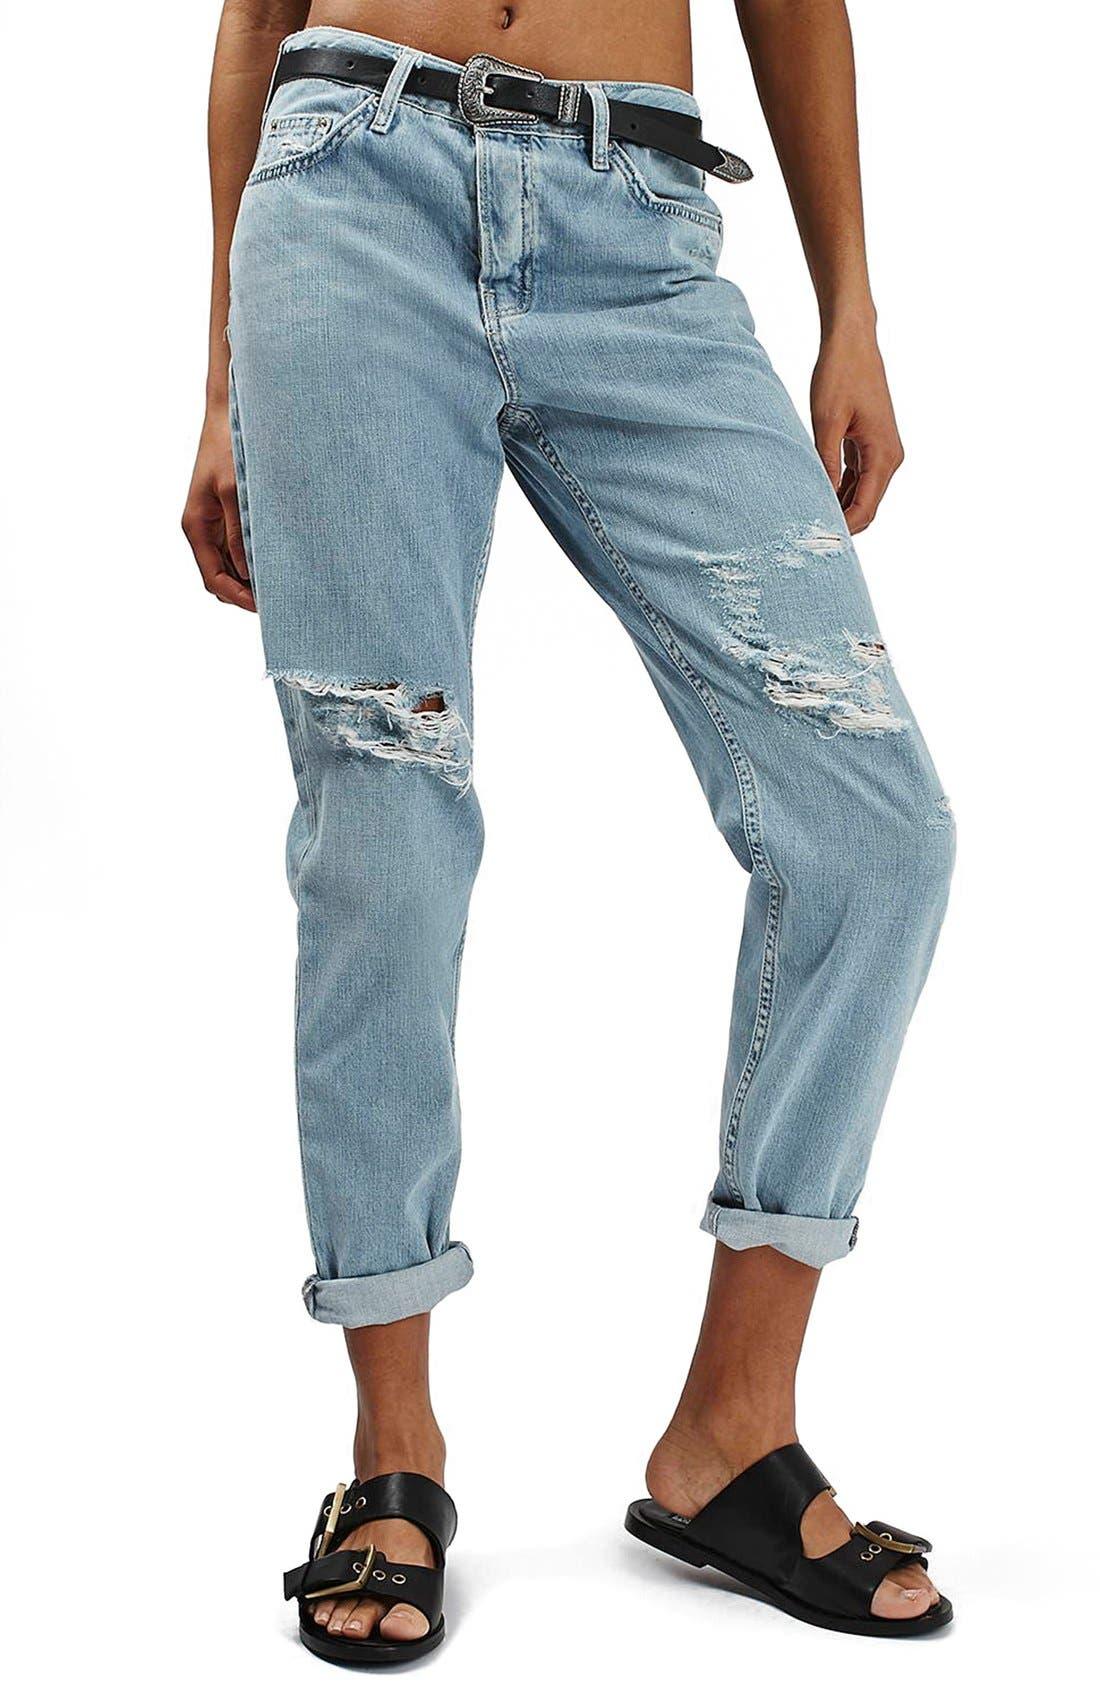 Alternate Image 1 Selected - Topshop 'Hayden' Bleach Ripped Boyfriend Jeans